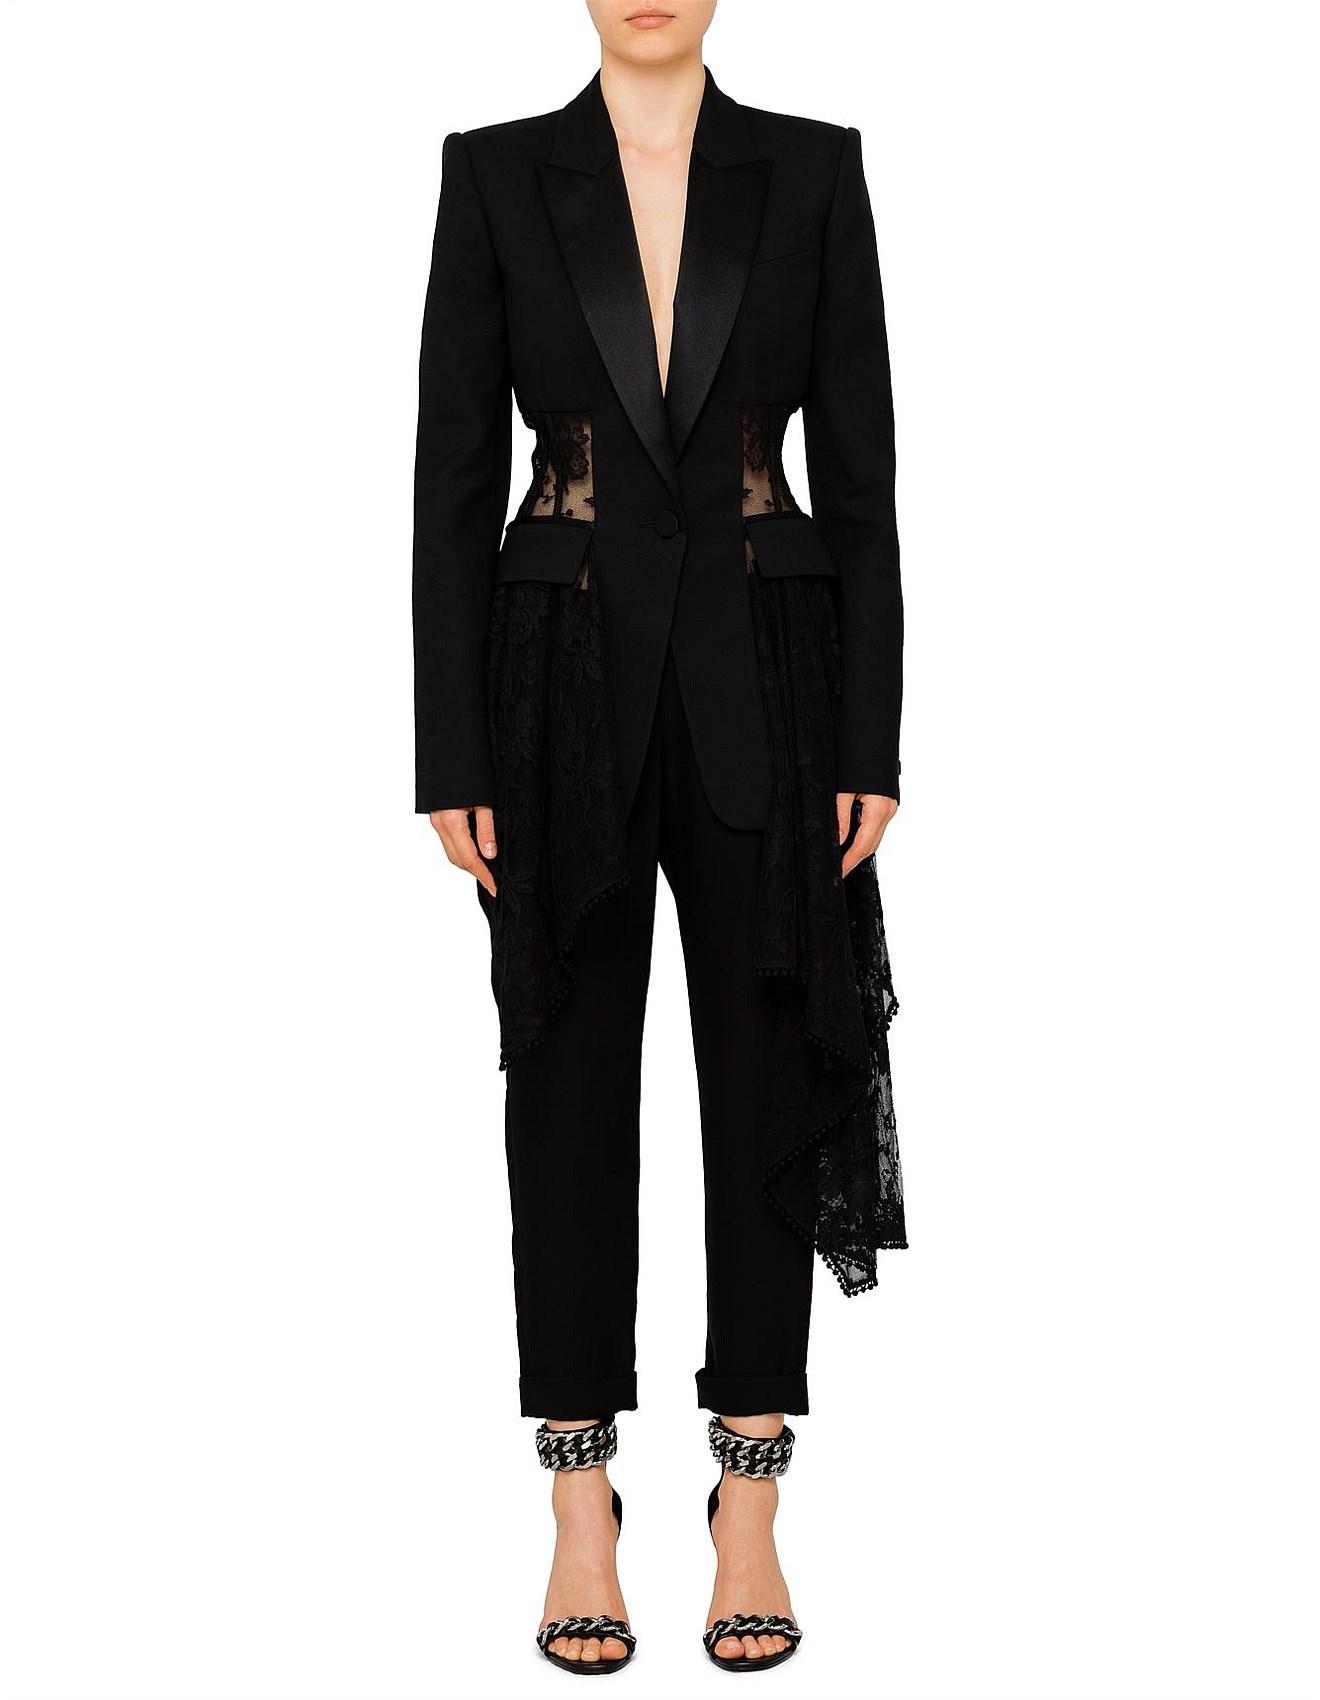 ef614aca9f Light Wool Lace Drape Corset Blazer